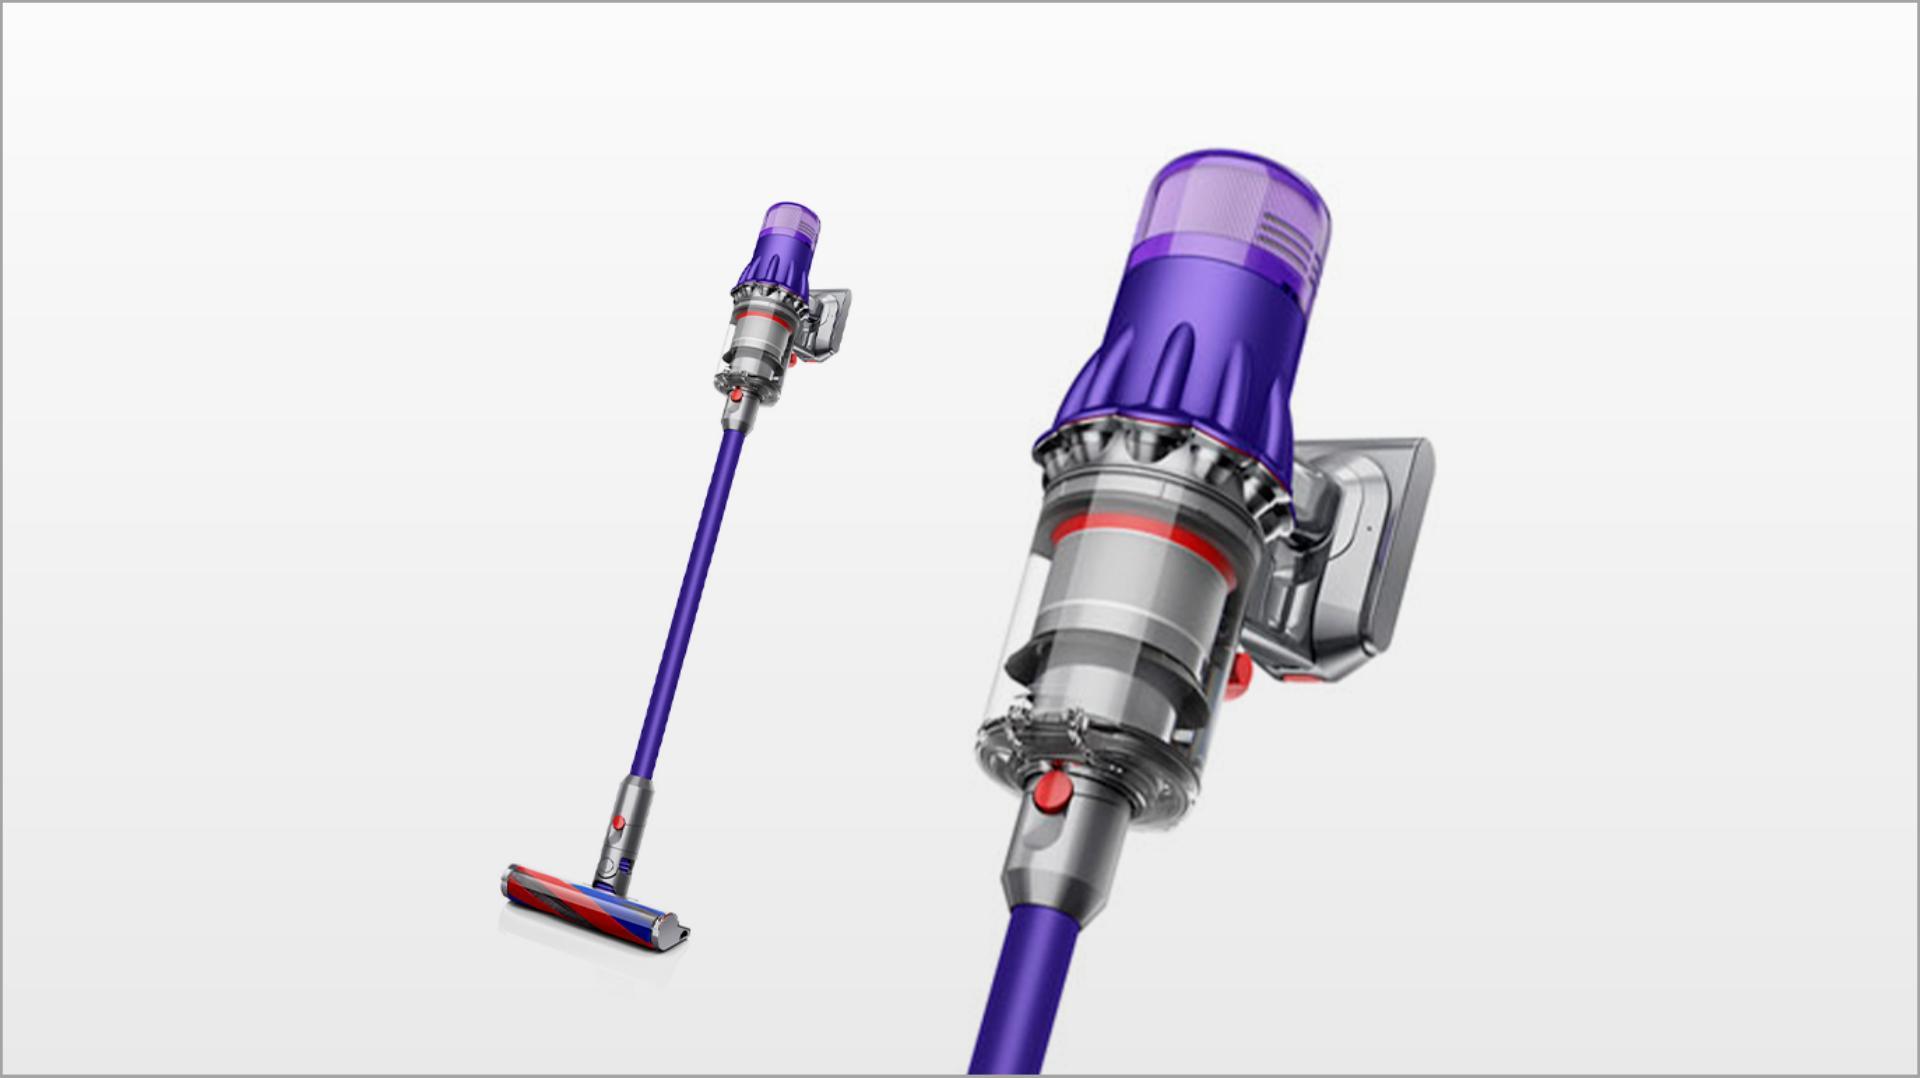 Dyson Digital Slim™ Fluffy Extra vacuum (Purple/Iron)